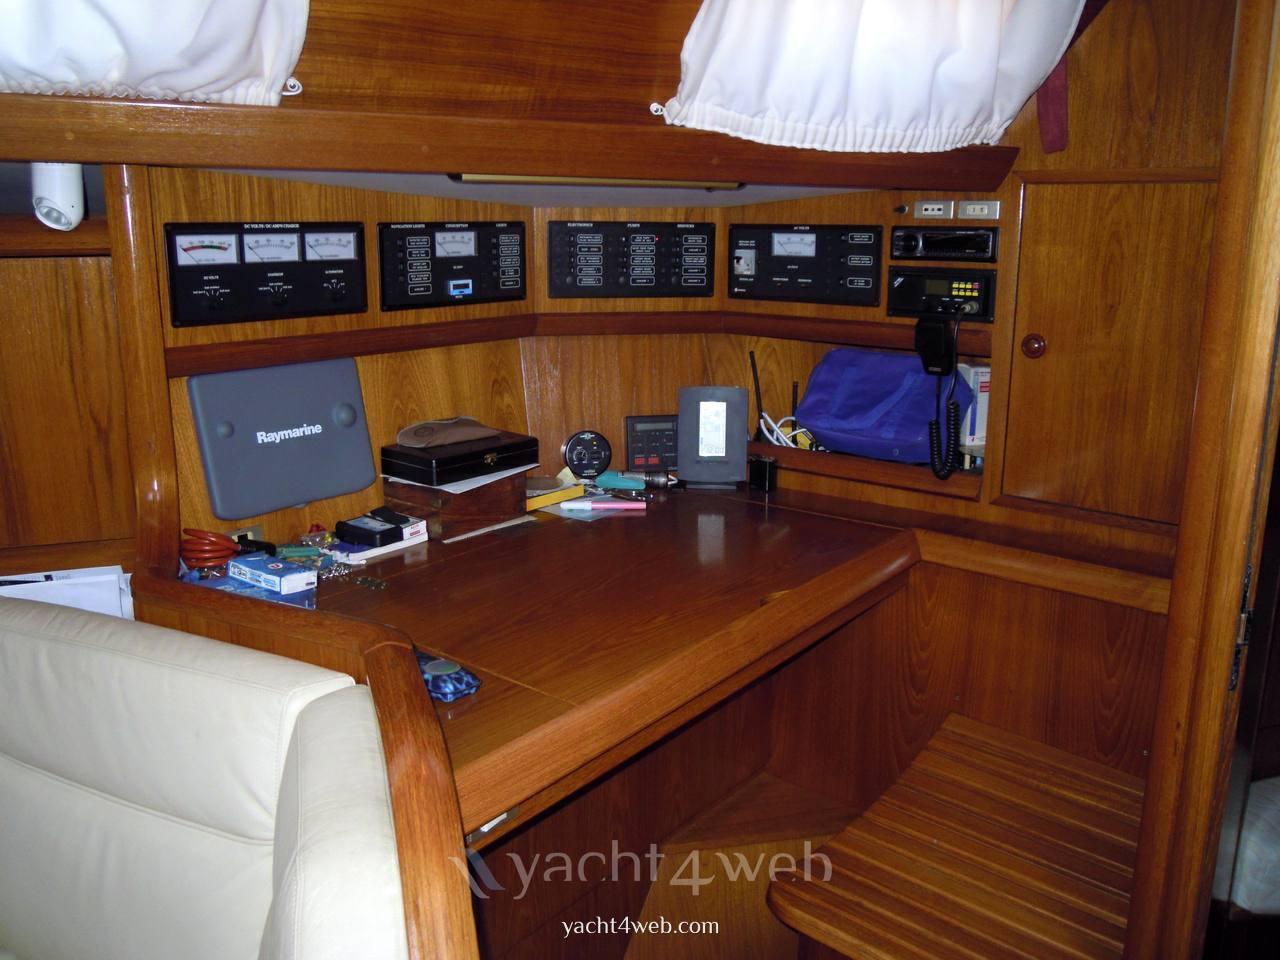 Jeanneau Sun odyssey 45.1 Sail cruiser used